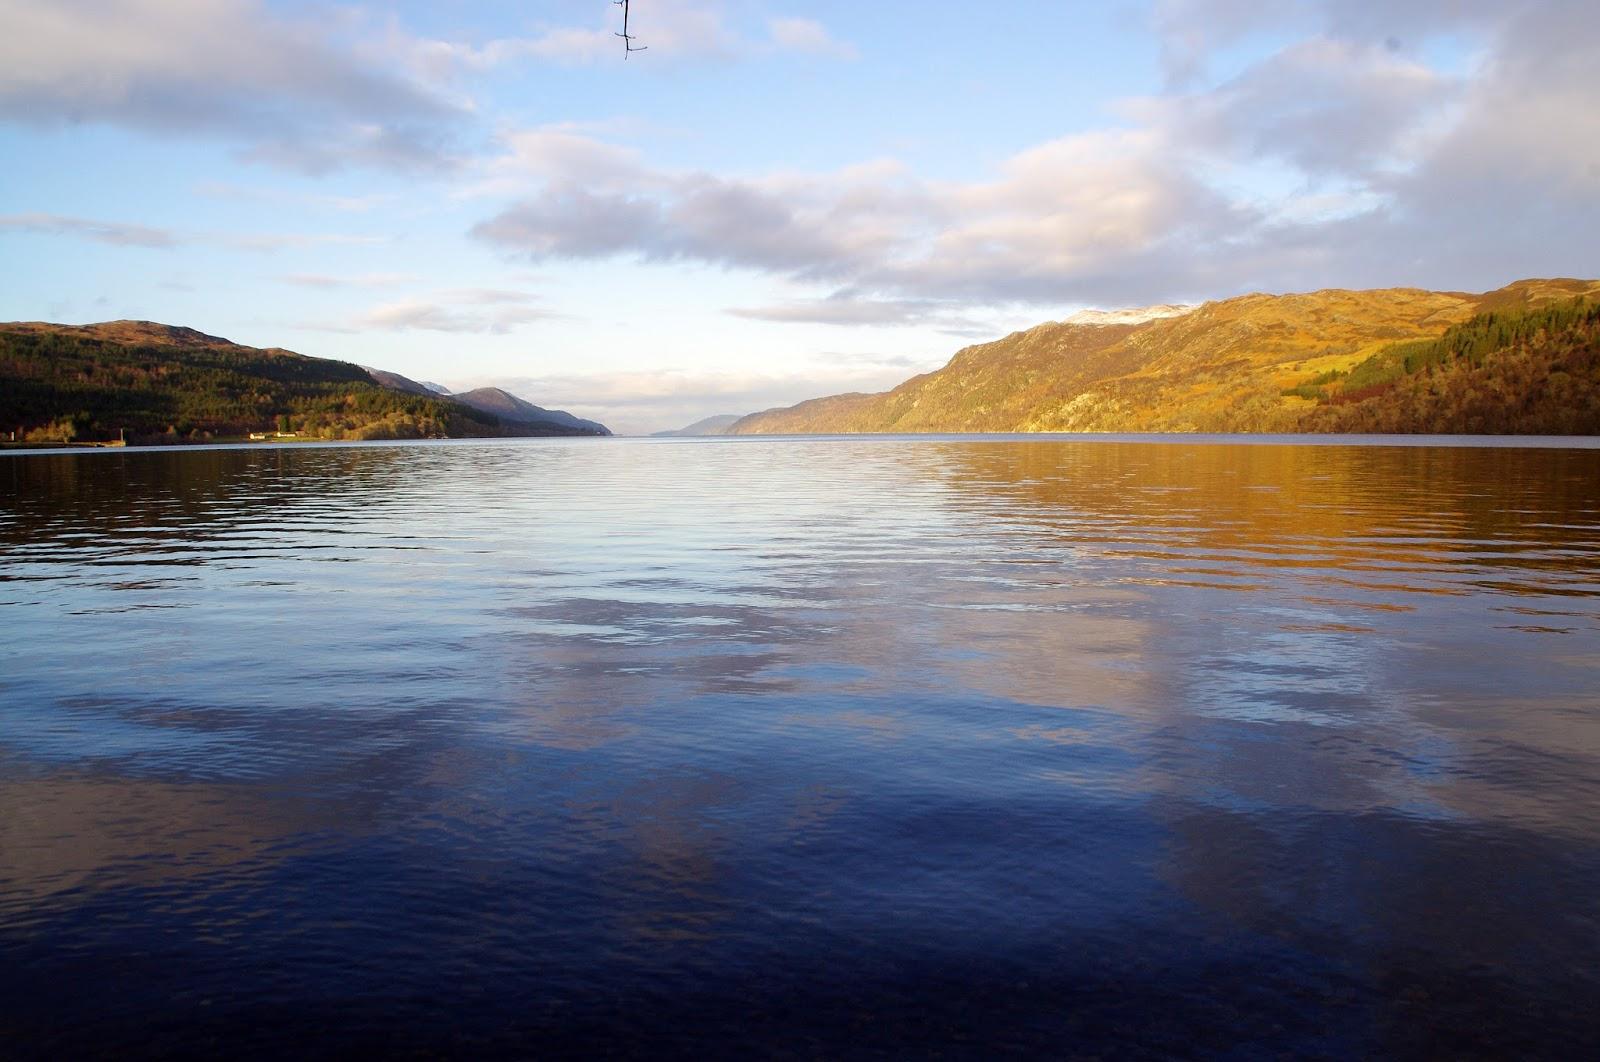 Loch Ness Scottish Highlands